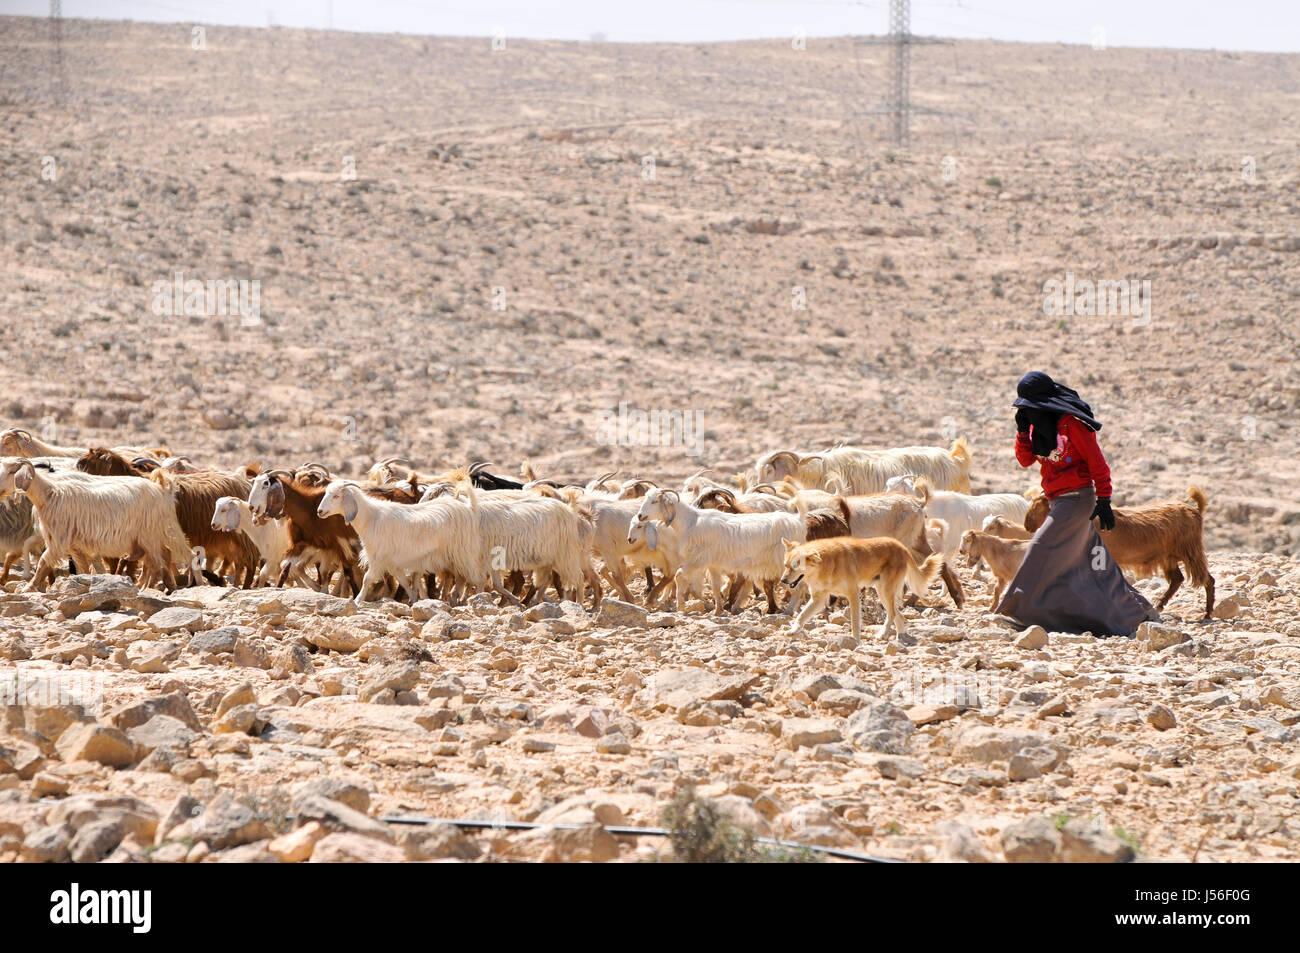 Israel, Negev desert, Mitzpe Ramon, female Bedouin shepherd and her herd of sheep - Stock Image